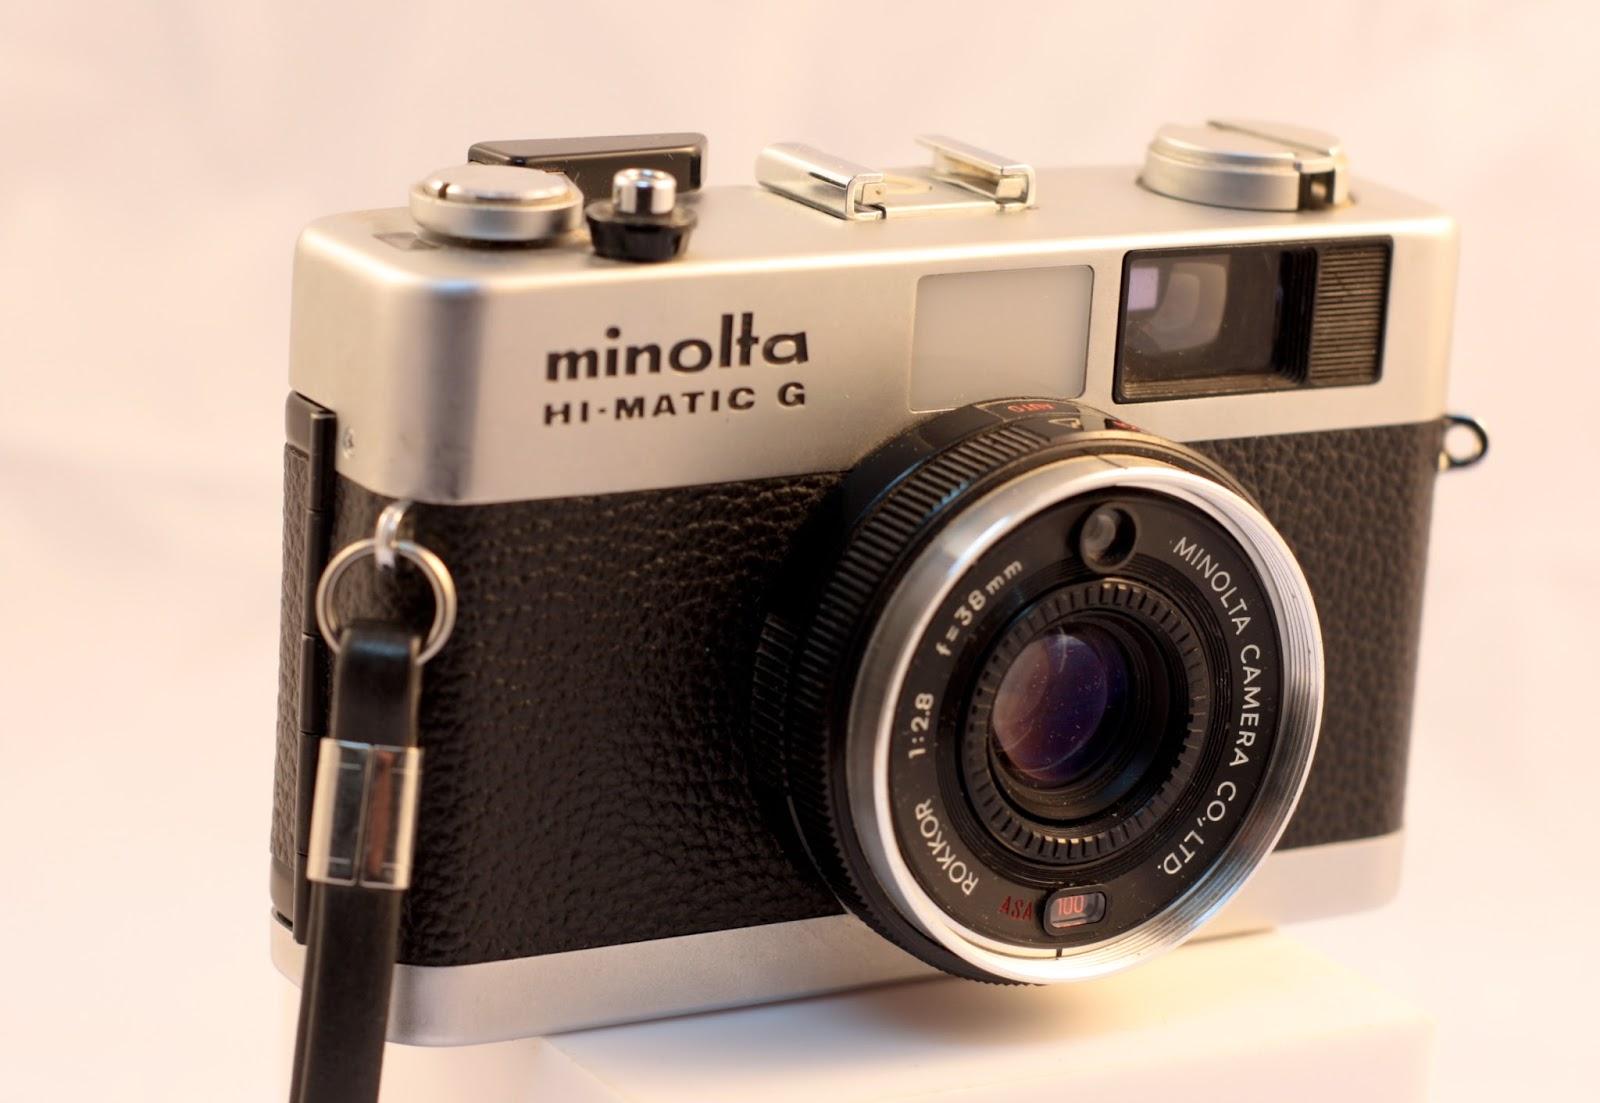 Random Camera Blog: The Minolta Hi-Matic G (Gee, it worked!)